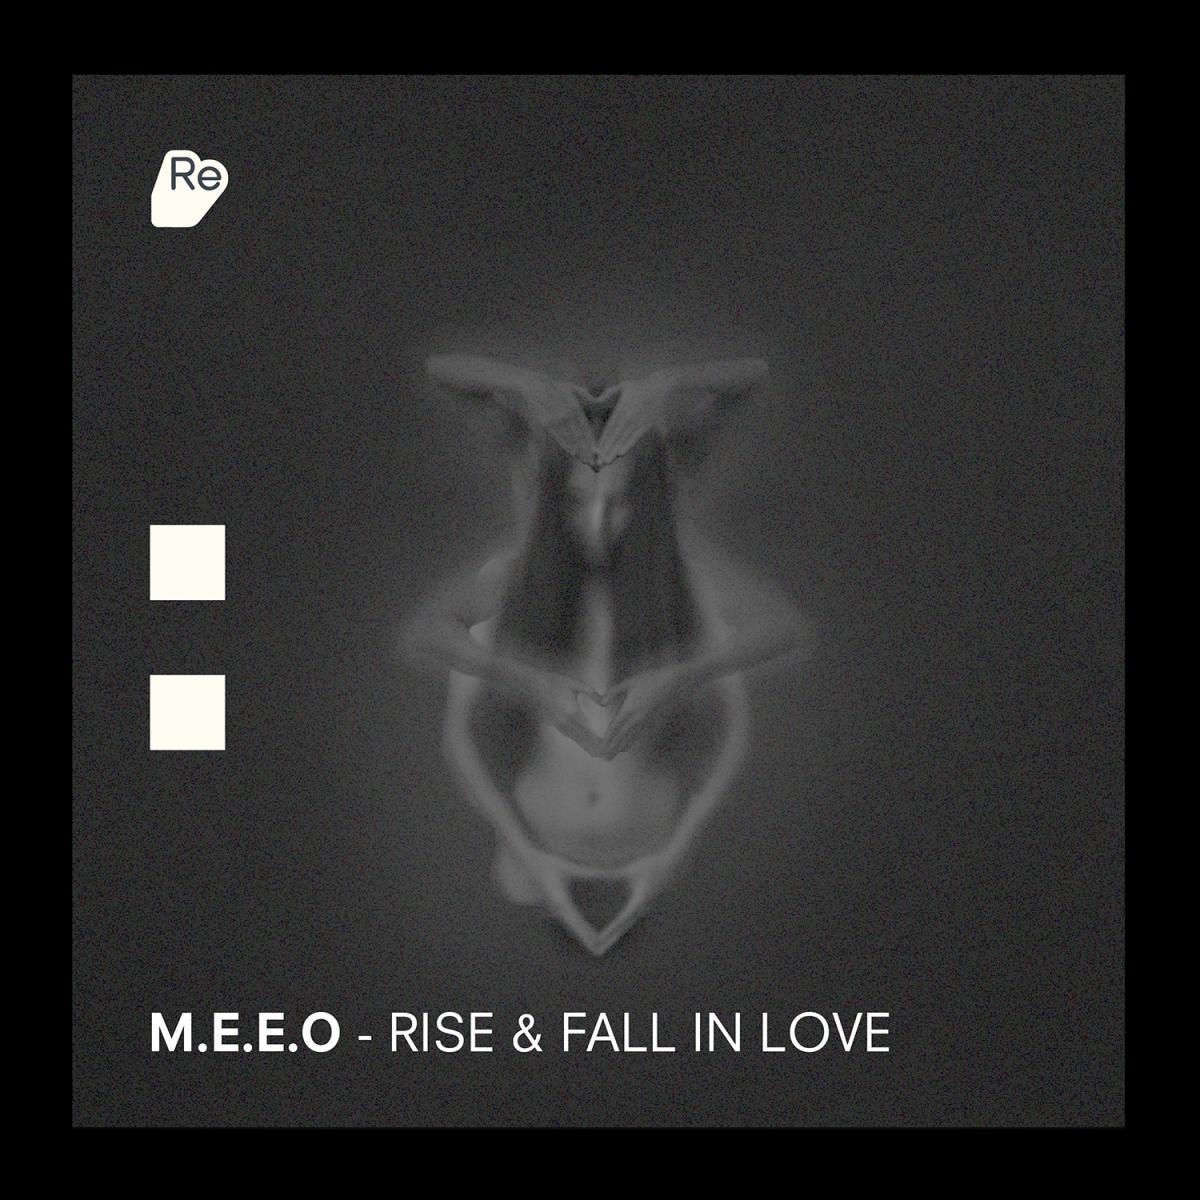 M.E.E.O - Rise & Fall In Love